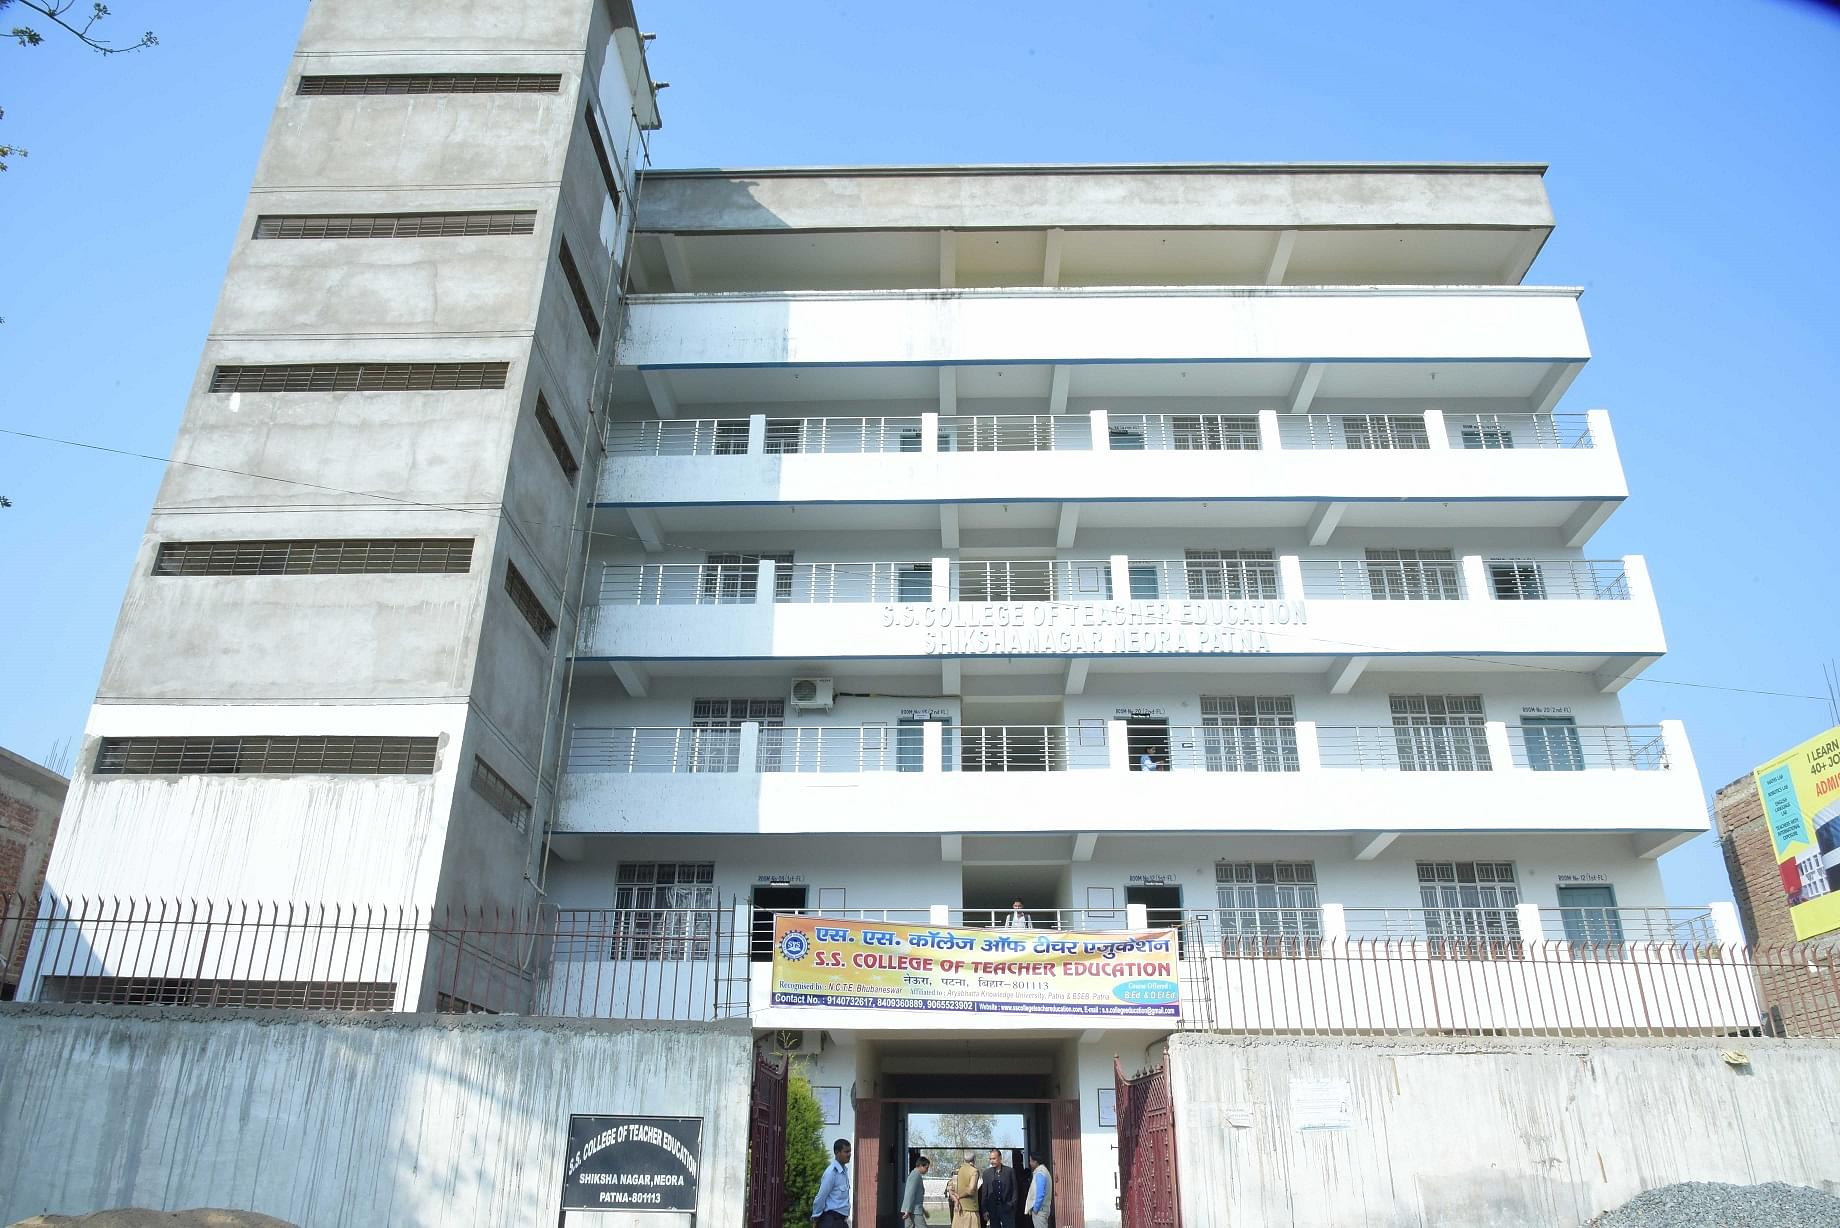 S.S College of Teacher Education